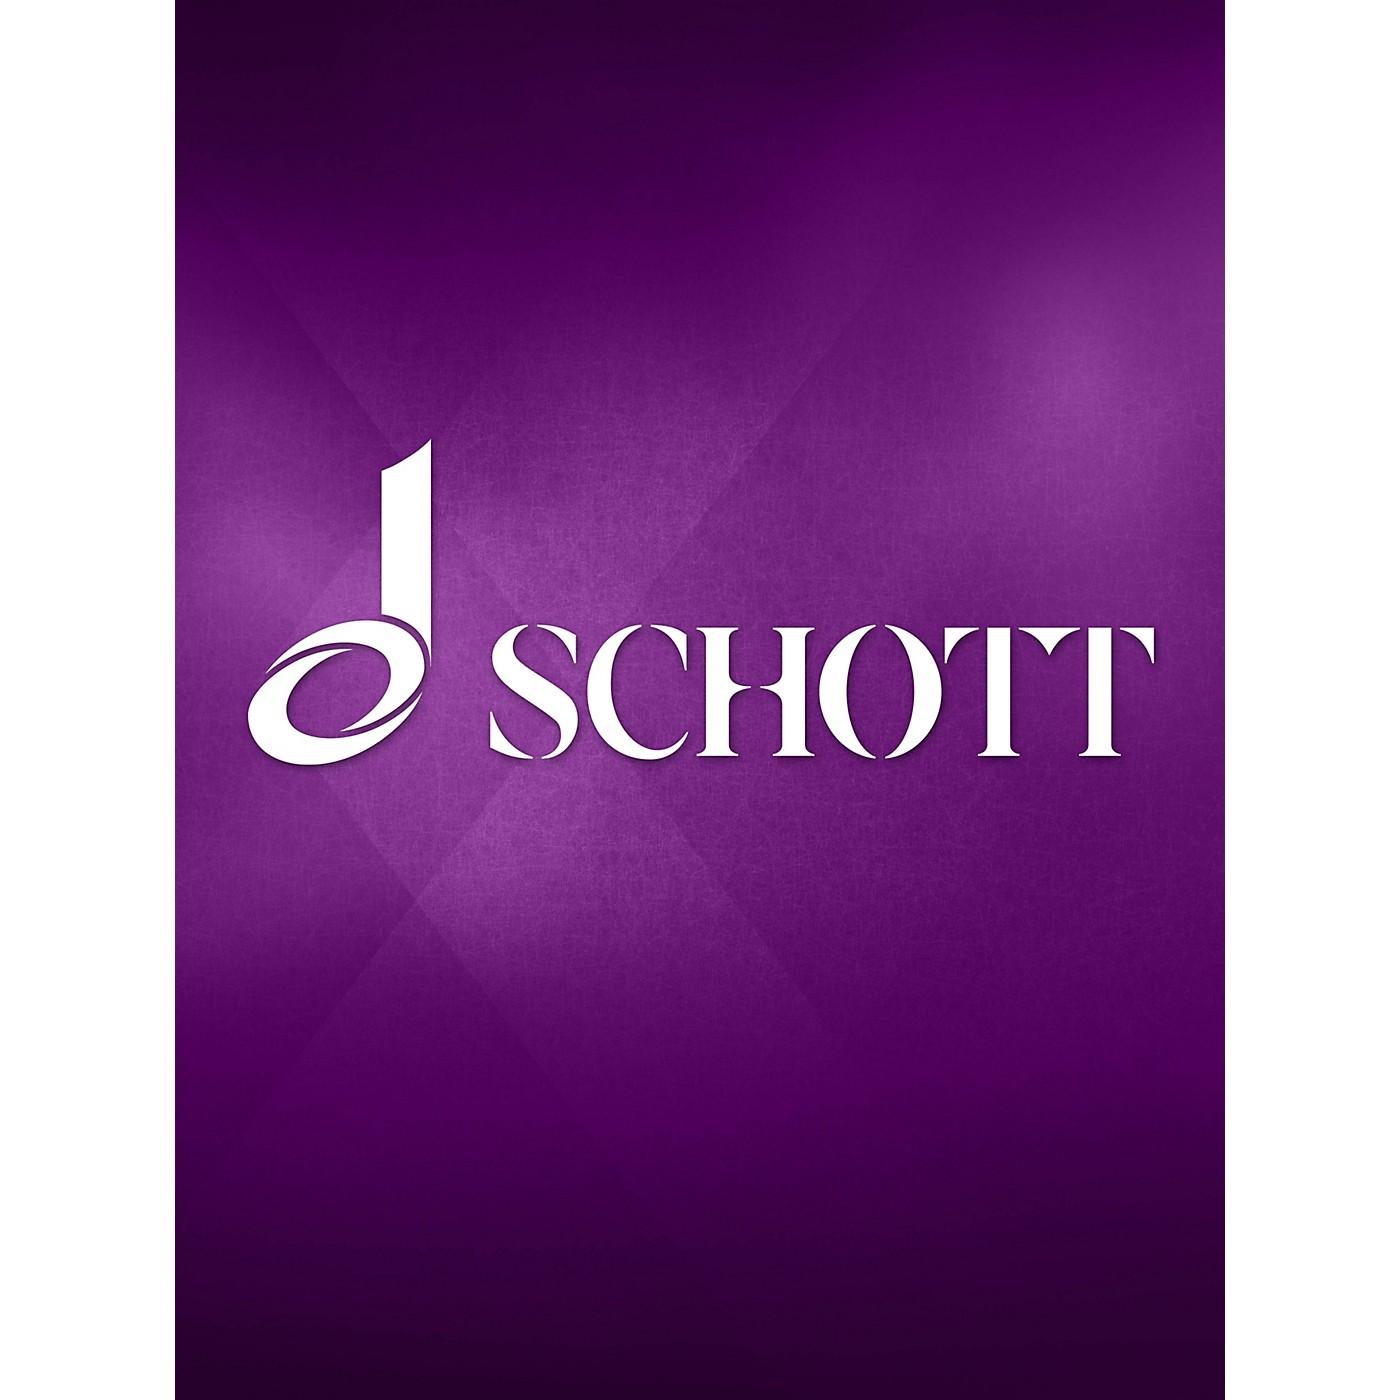 Hal Leonard Practicing Etudes: Basics of Cello Technique in Selected Etudes, Volume 2 Schott Series Softcover thumbnail